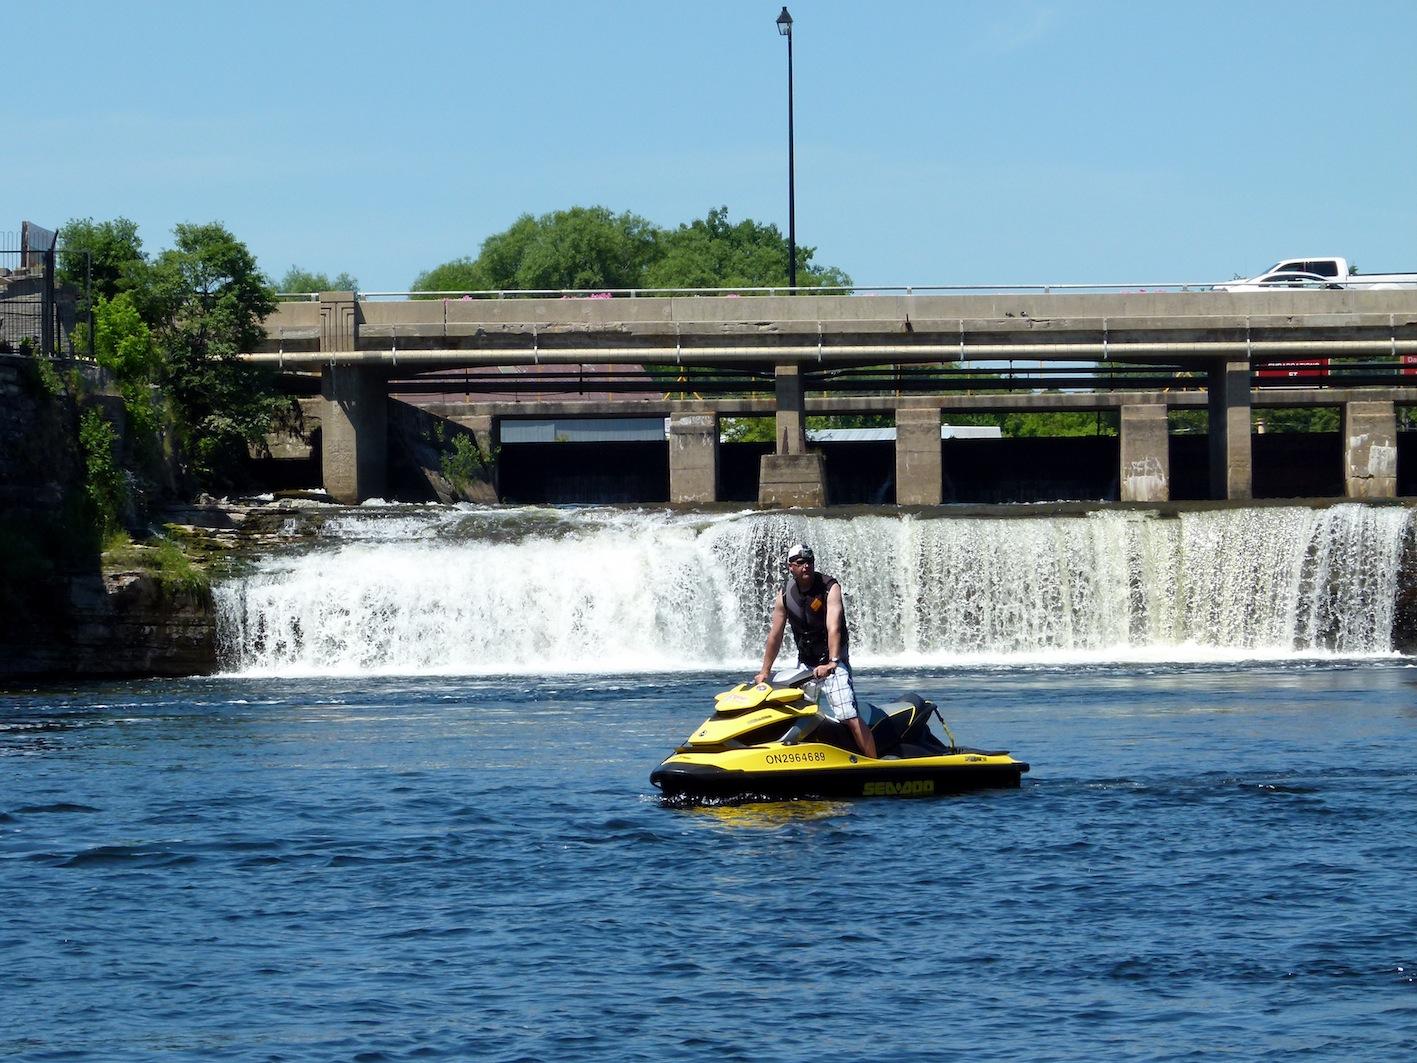 At the Fenelon Falls dam in the Kawartha Lakes Sea Doo tour